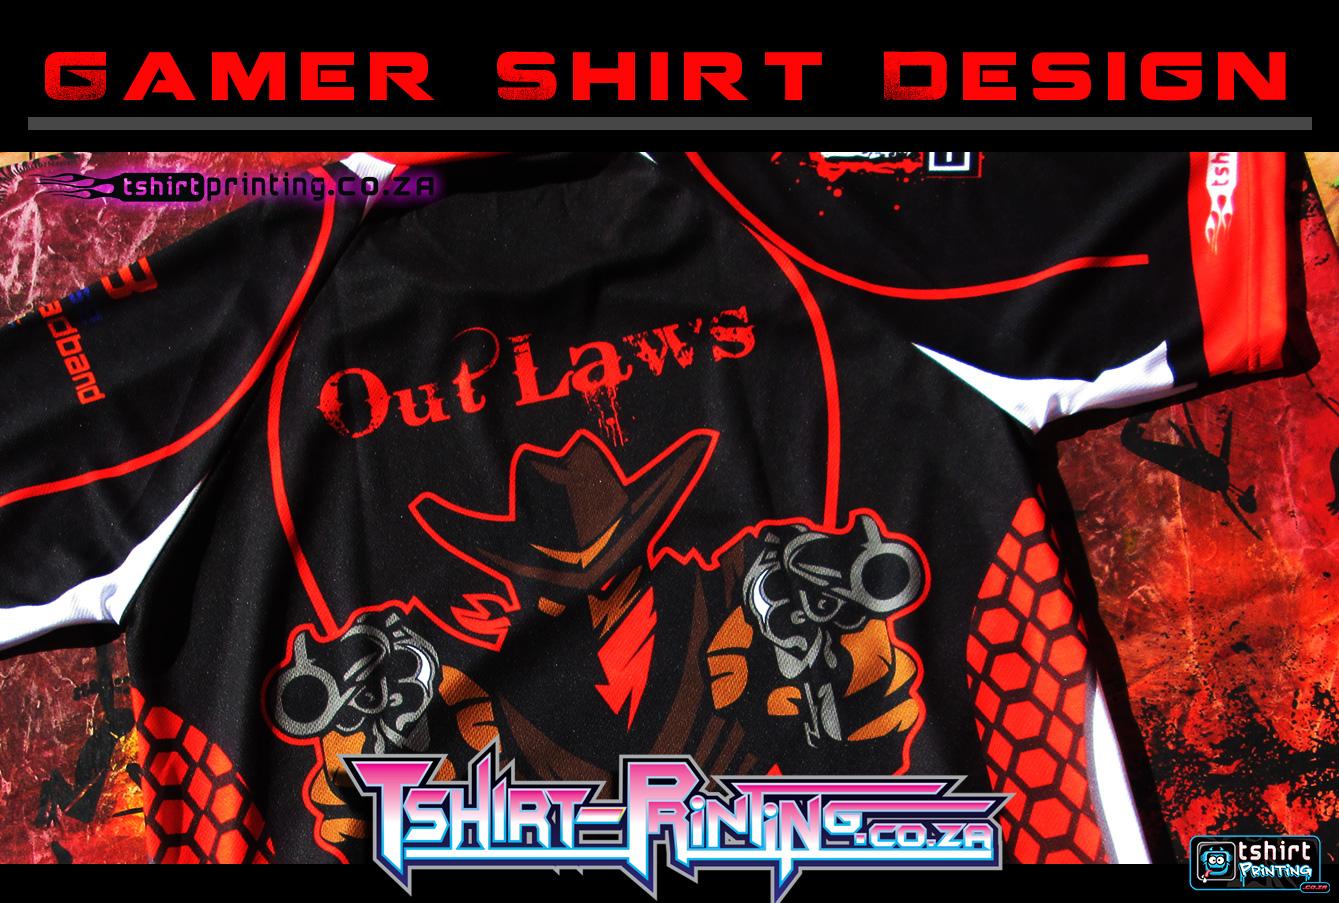 gamer-shirt-design-prnted-shirt-outlaws